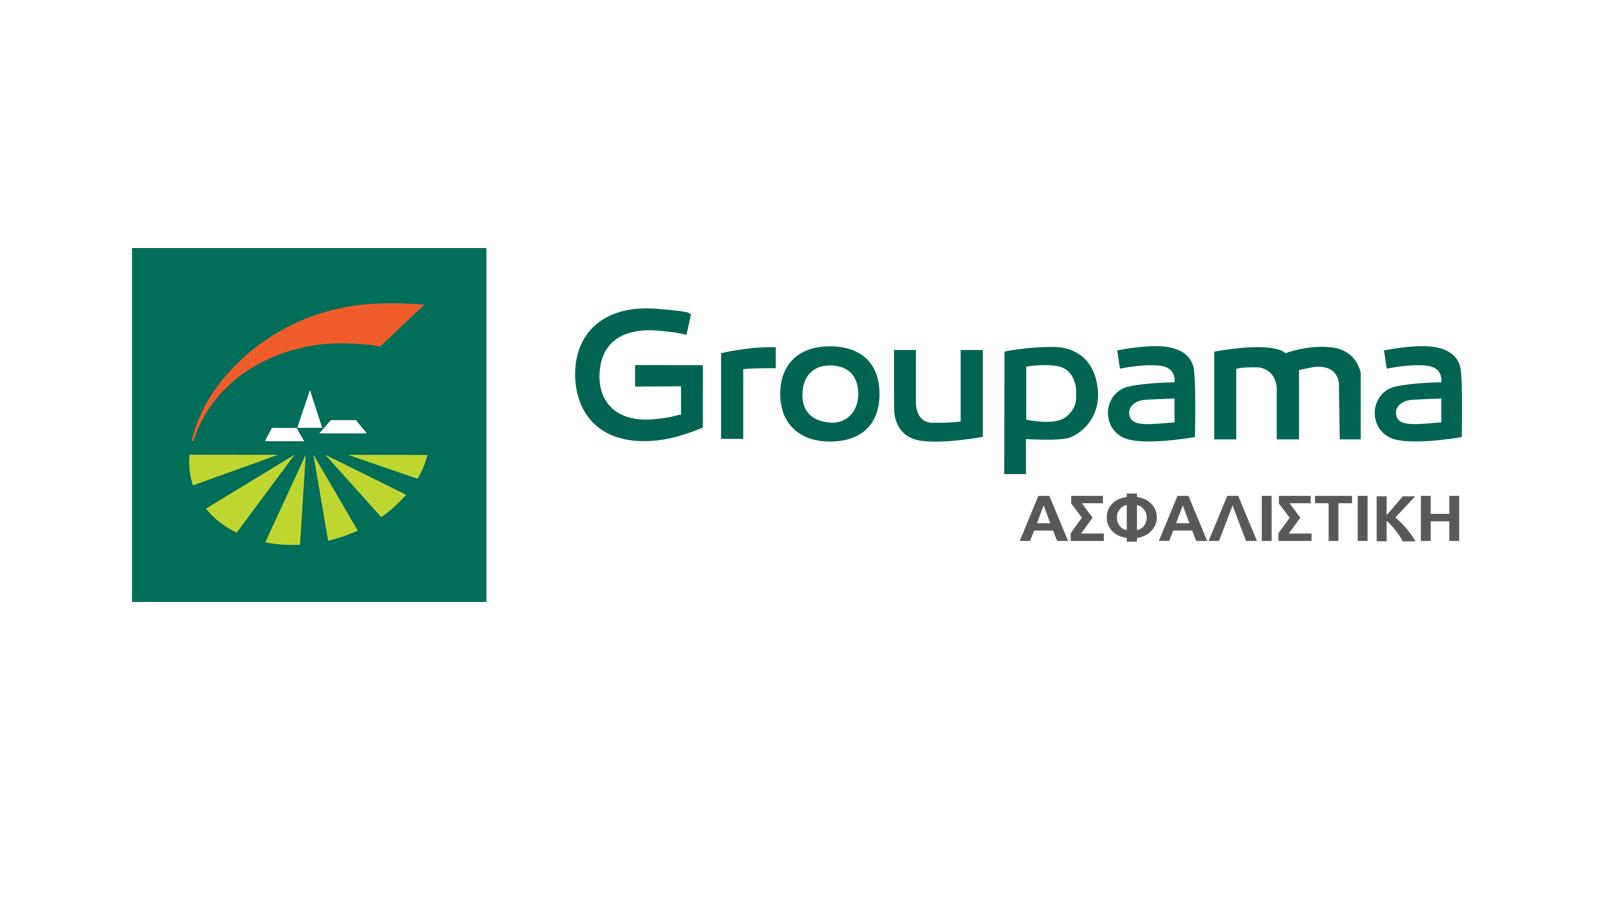 Groupama Ασφαλιστική λογότυπο